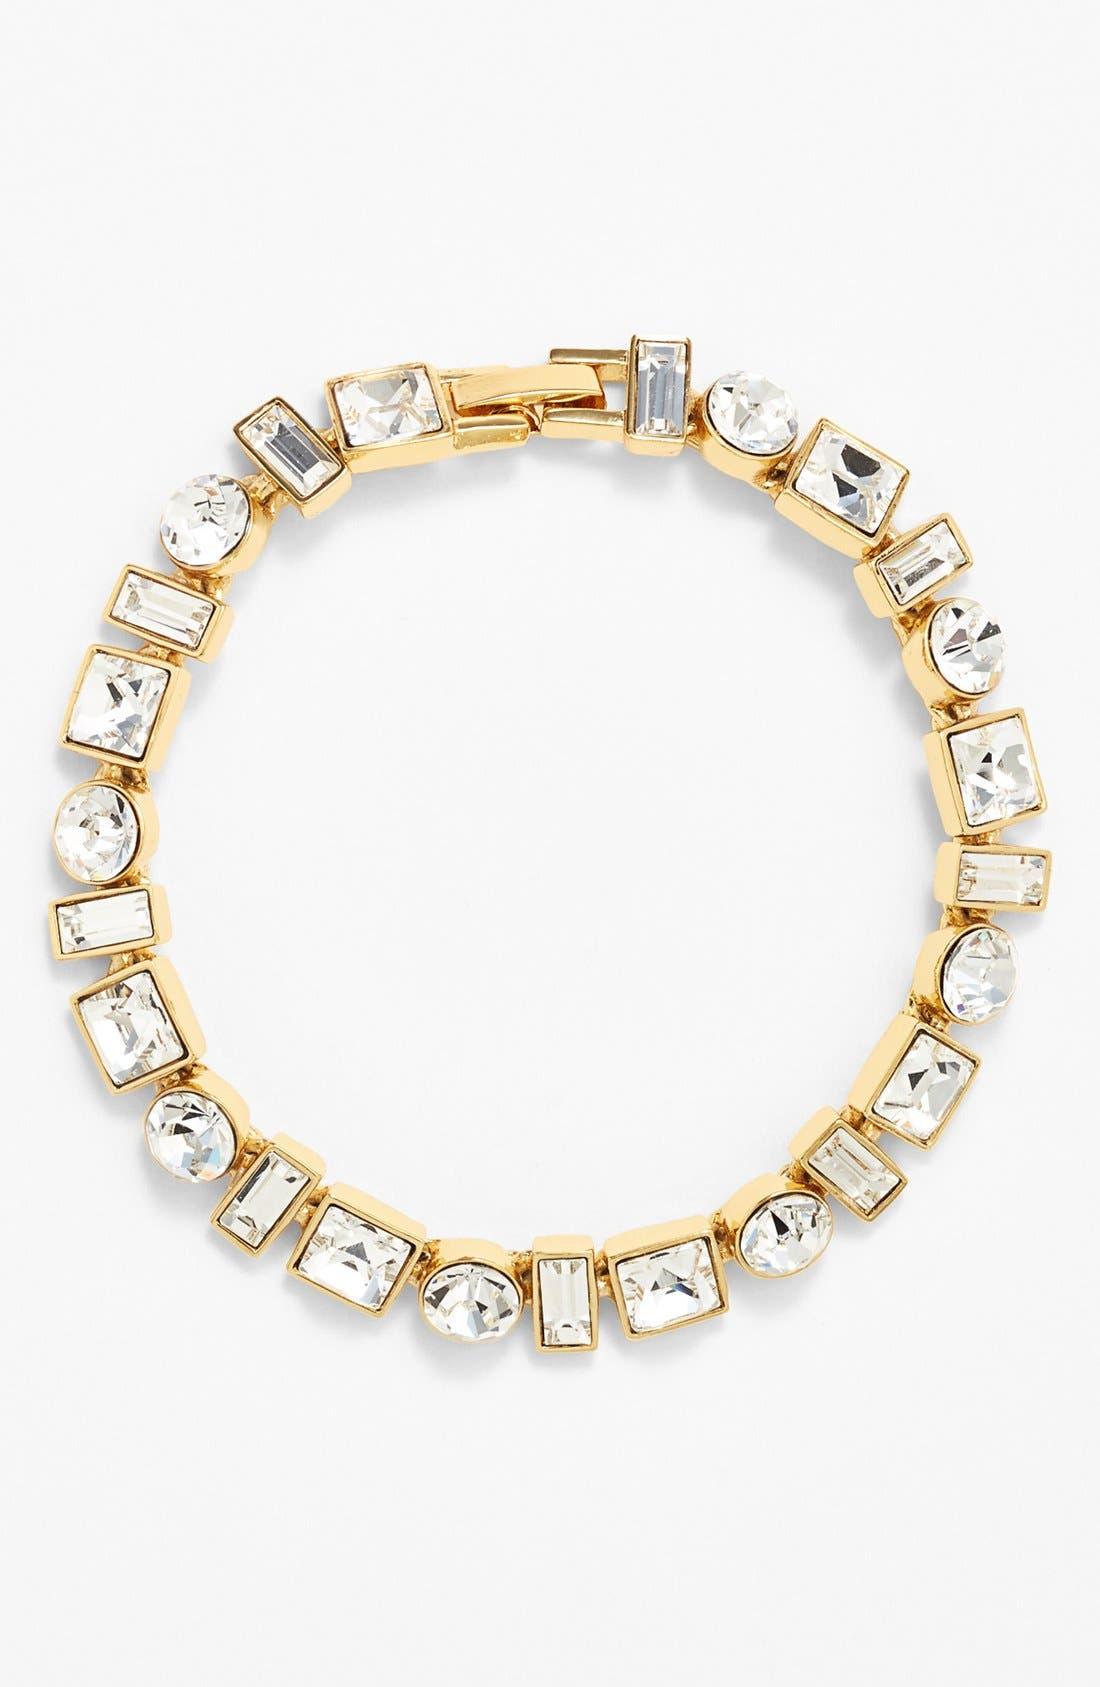 Main Image - kate spade new york 'flash mob' line bracelet